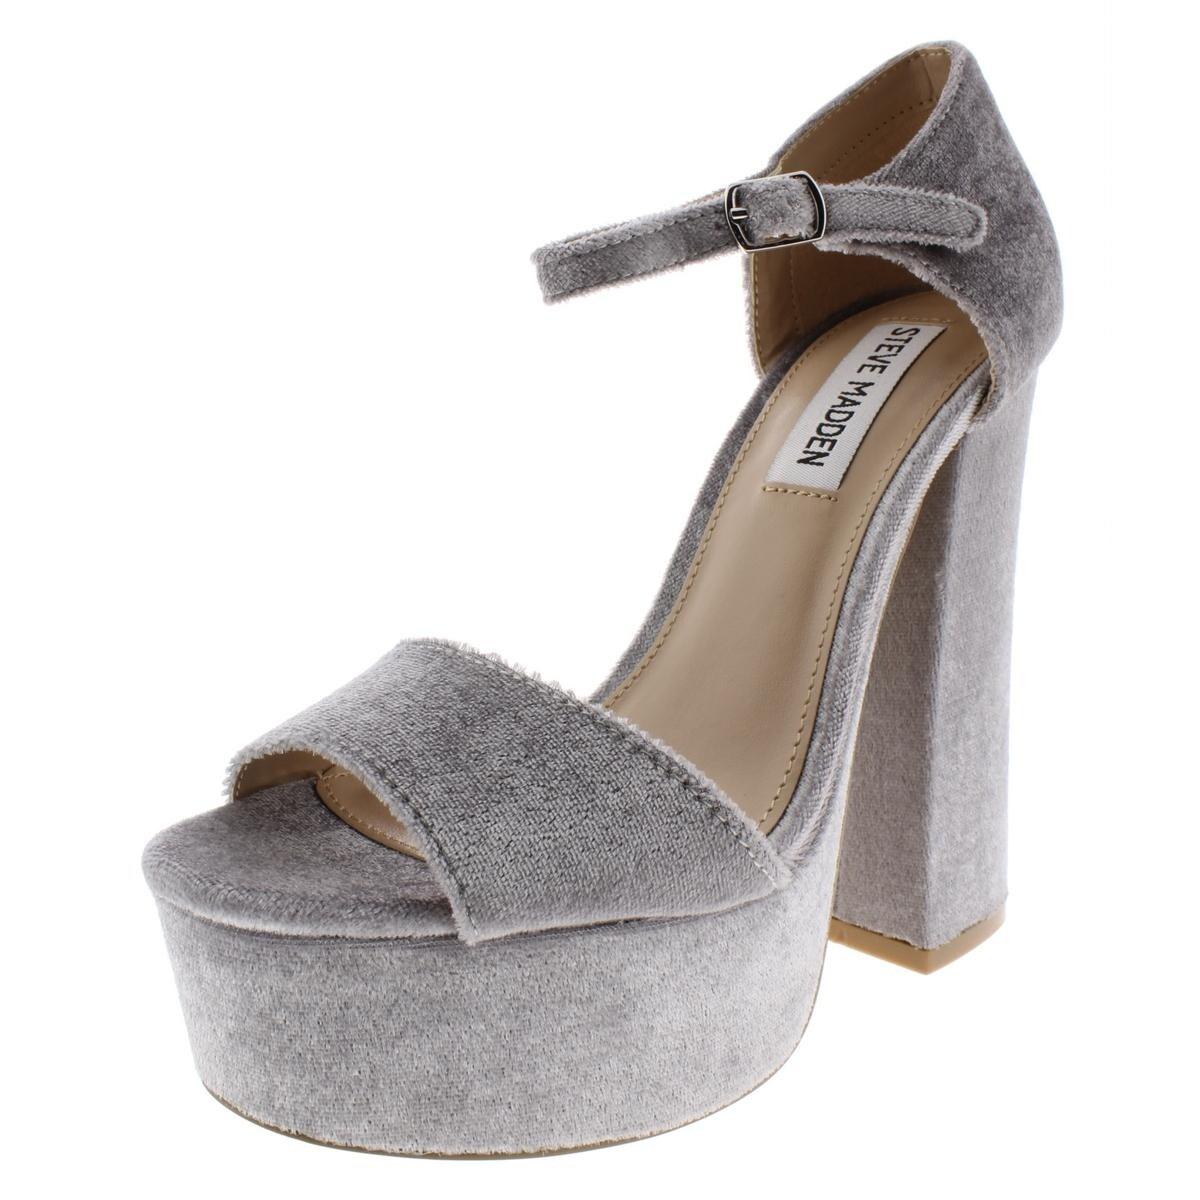 62c3024e602 Steve Madden Womens Bonita Platform Sandals Heels